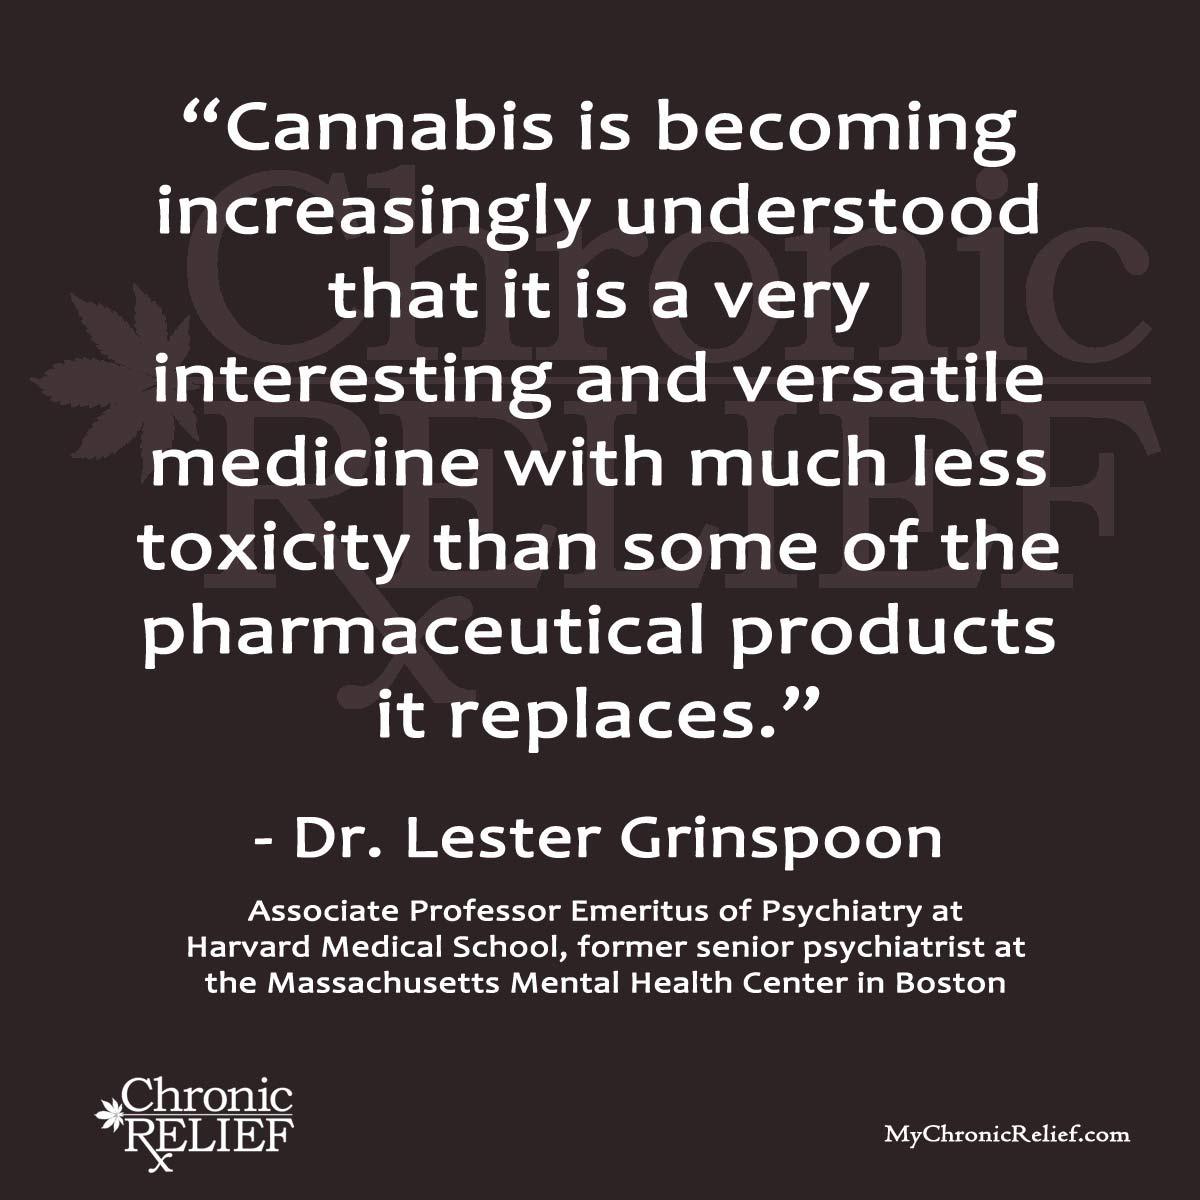 #MedicalMarijuana #plantsnotpills #regenerativerevolution https://t.co/X7ubW1hj4u